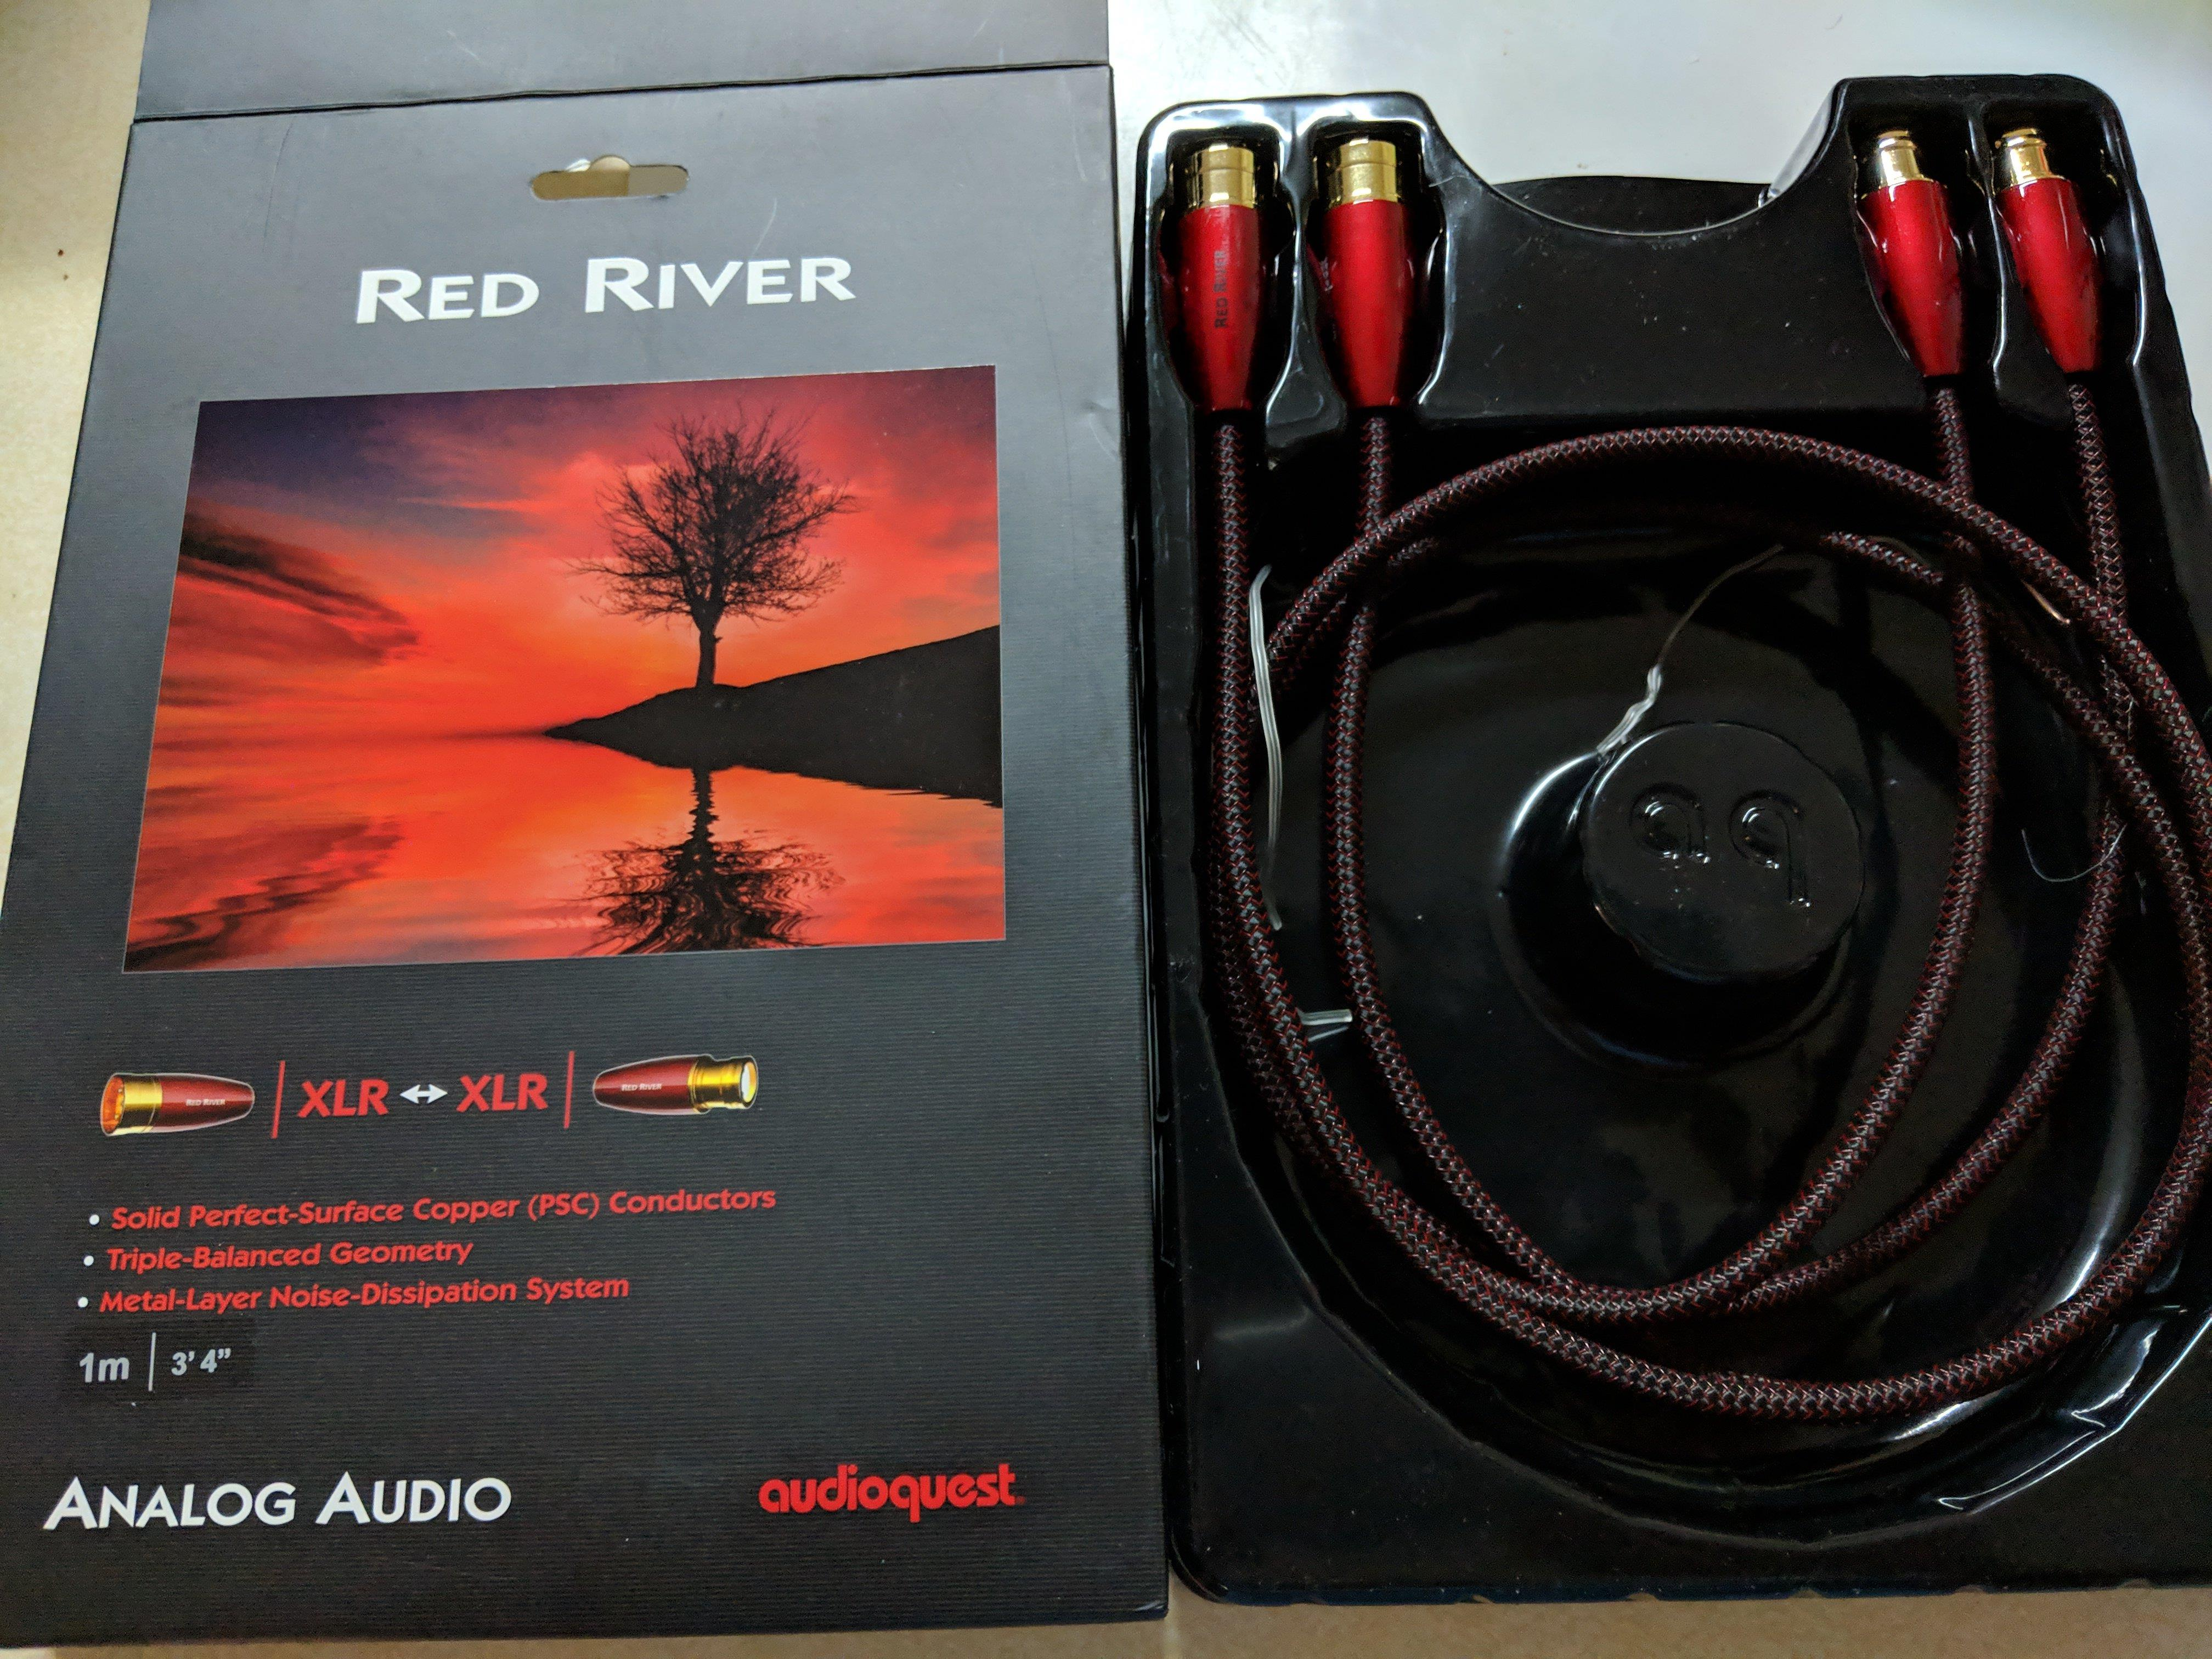 AudioQuest Red River XLR - XLR 1m